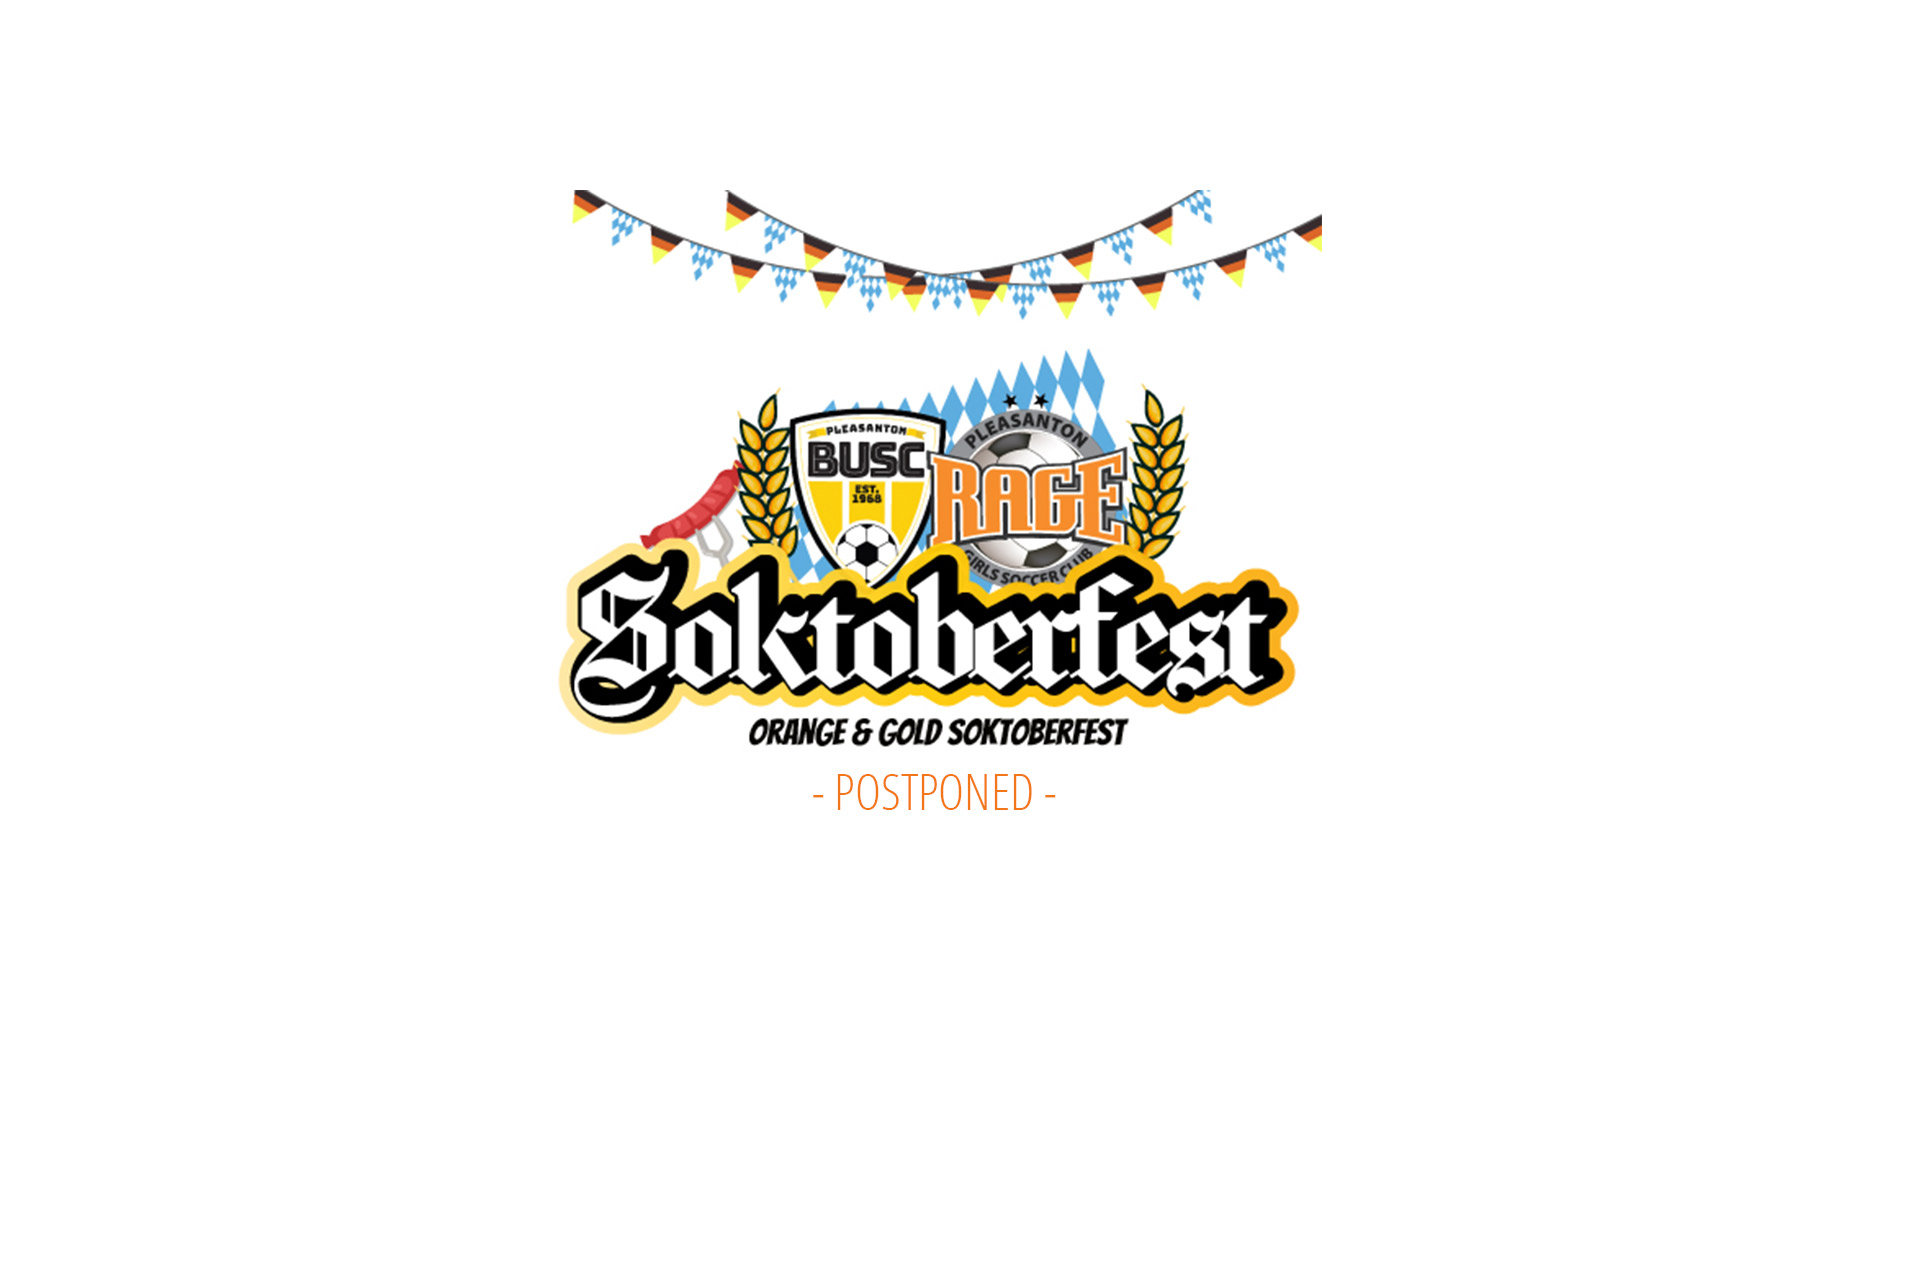 Soktoberfest -postponed